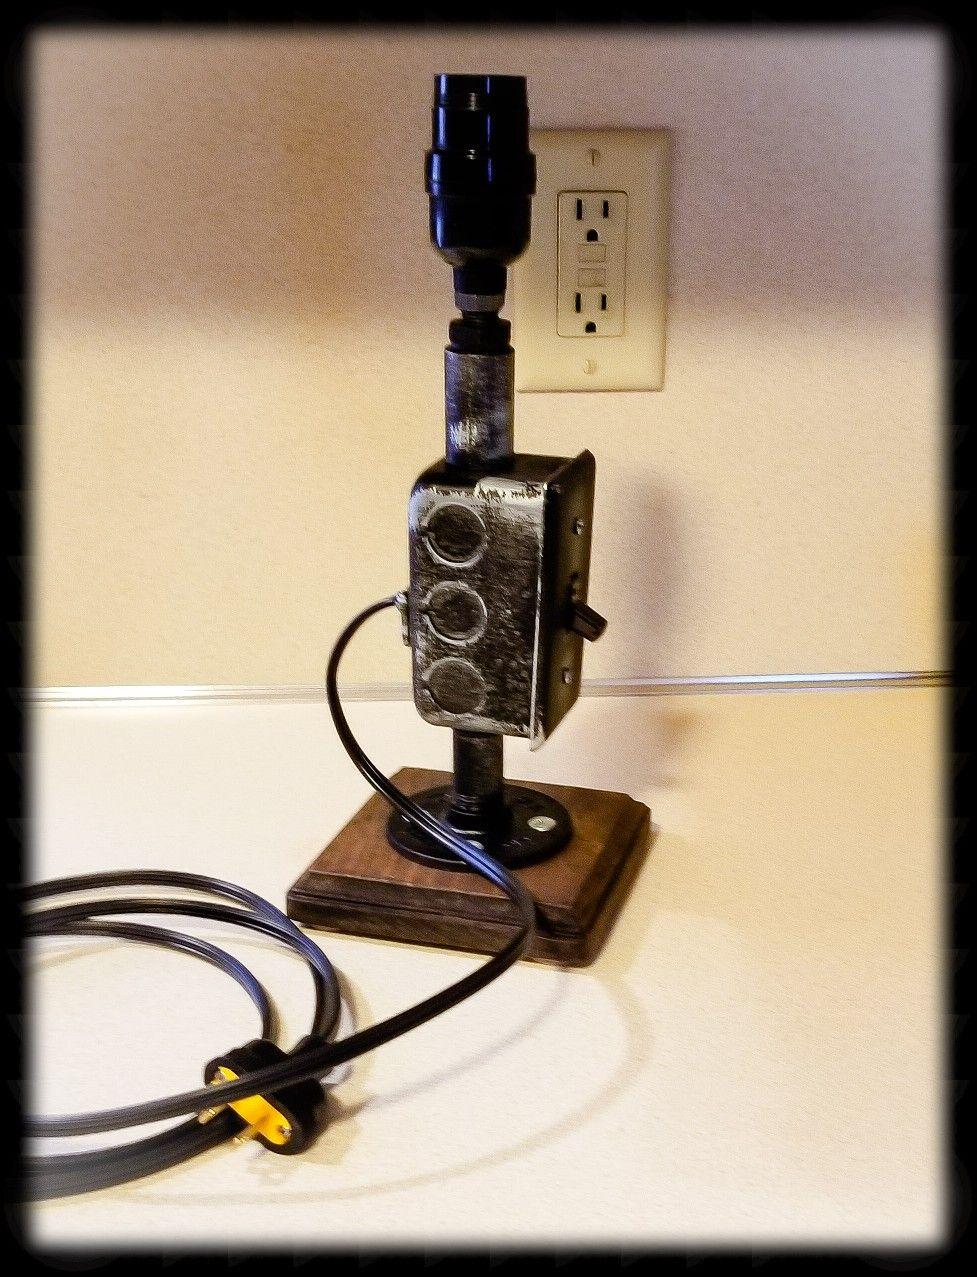 Industrial Desk Lamp, Steampunk Table Lamp, Nightstand